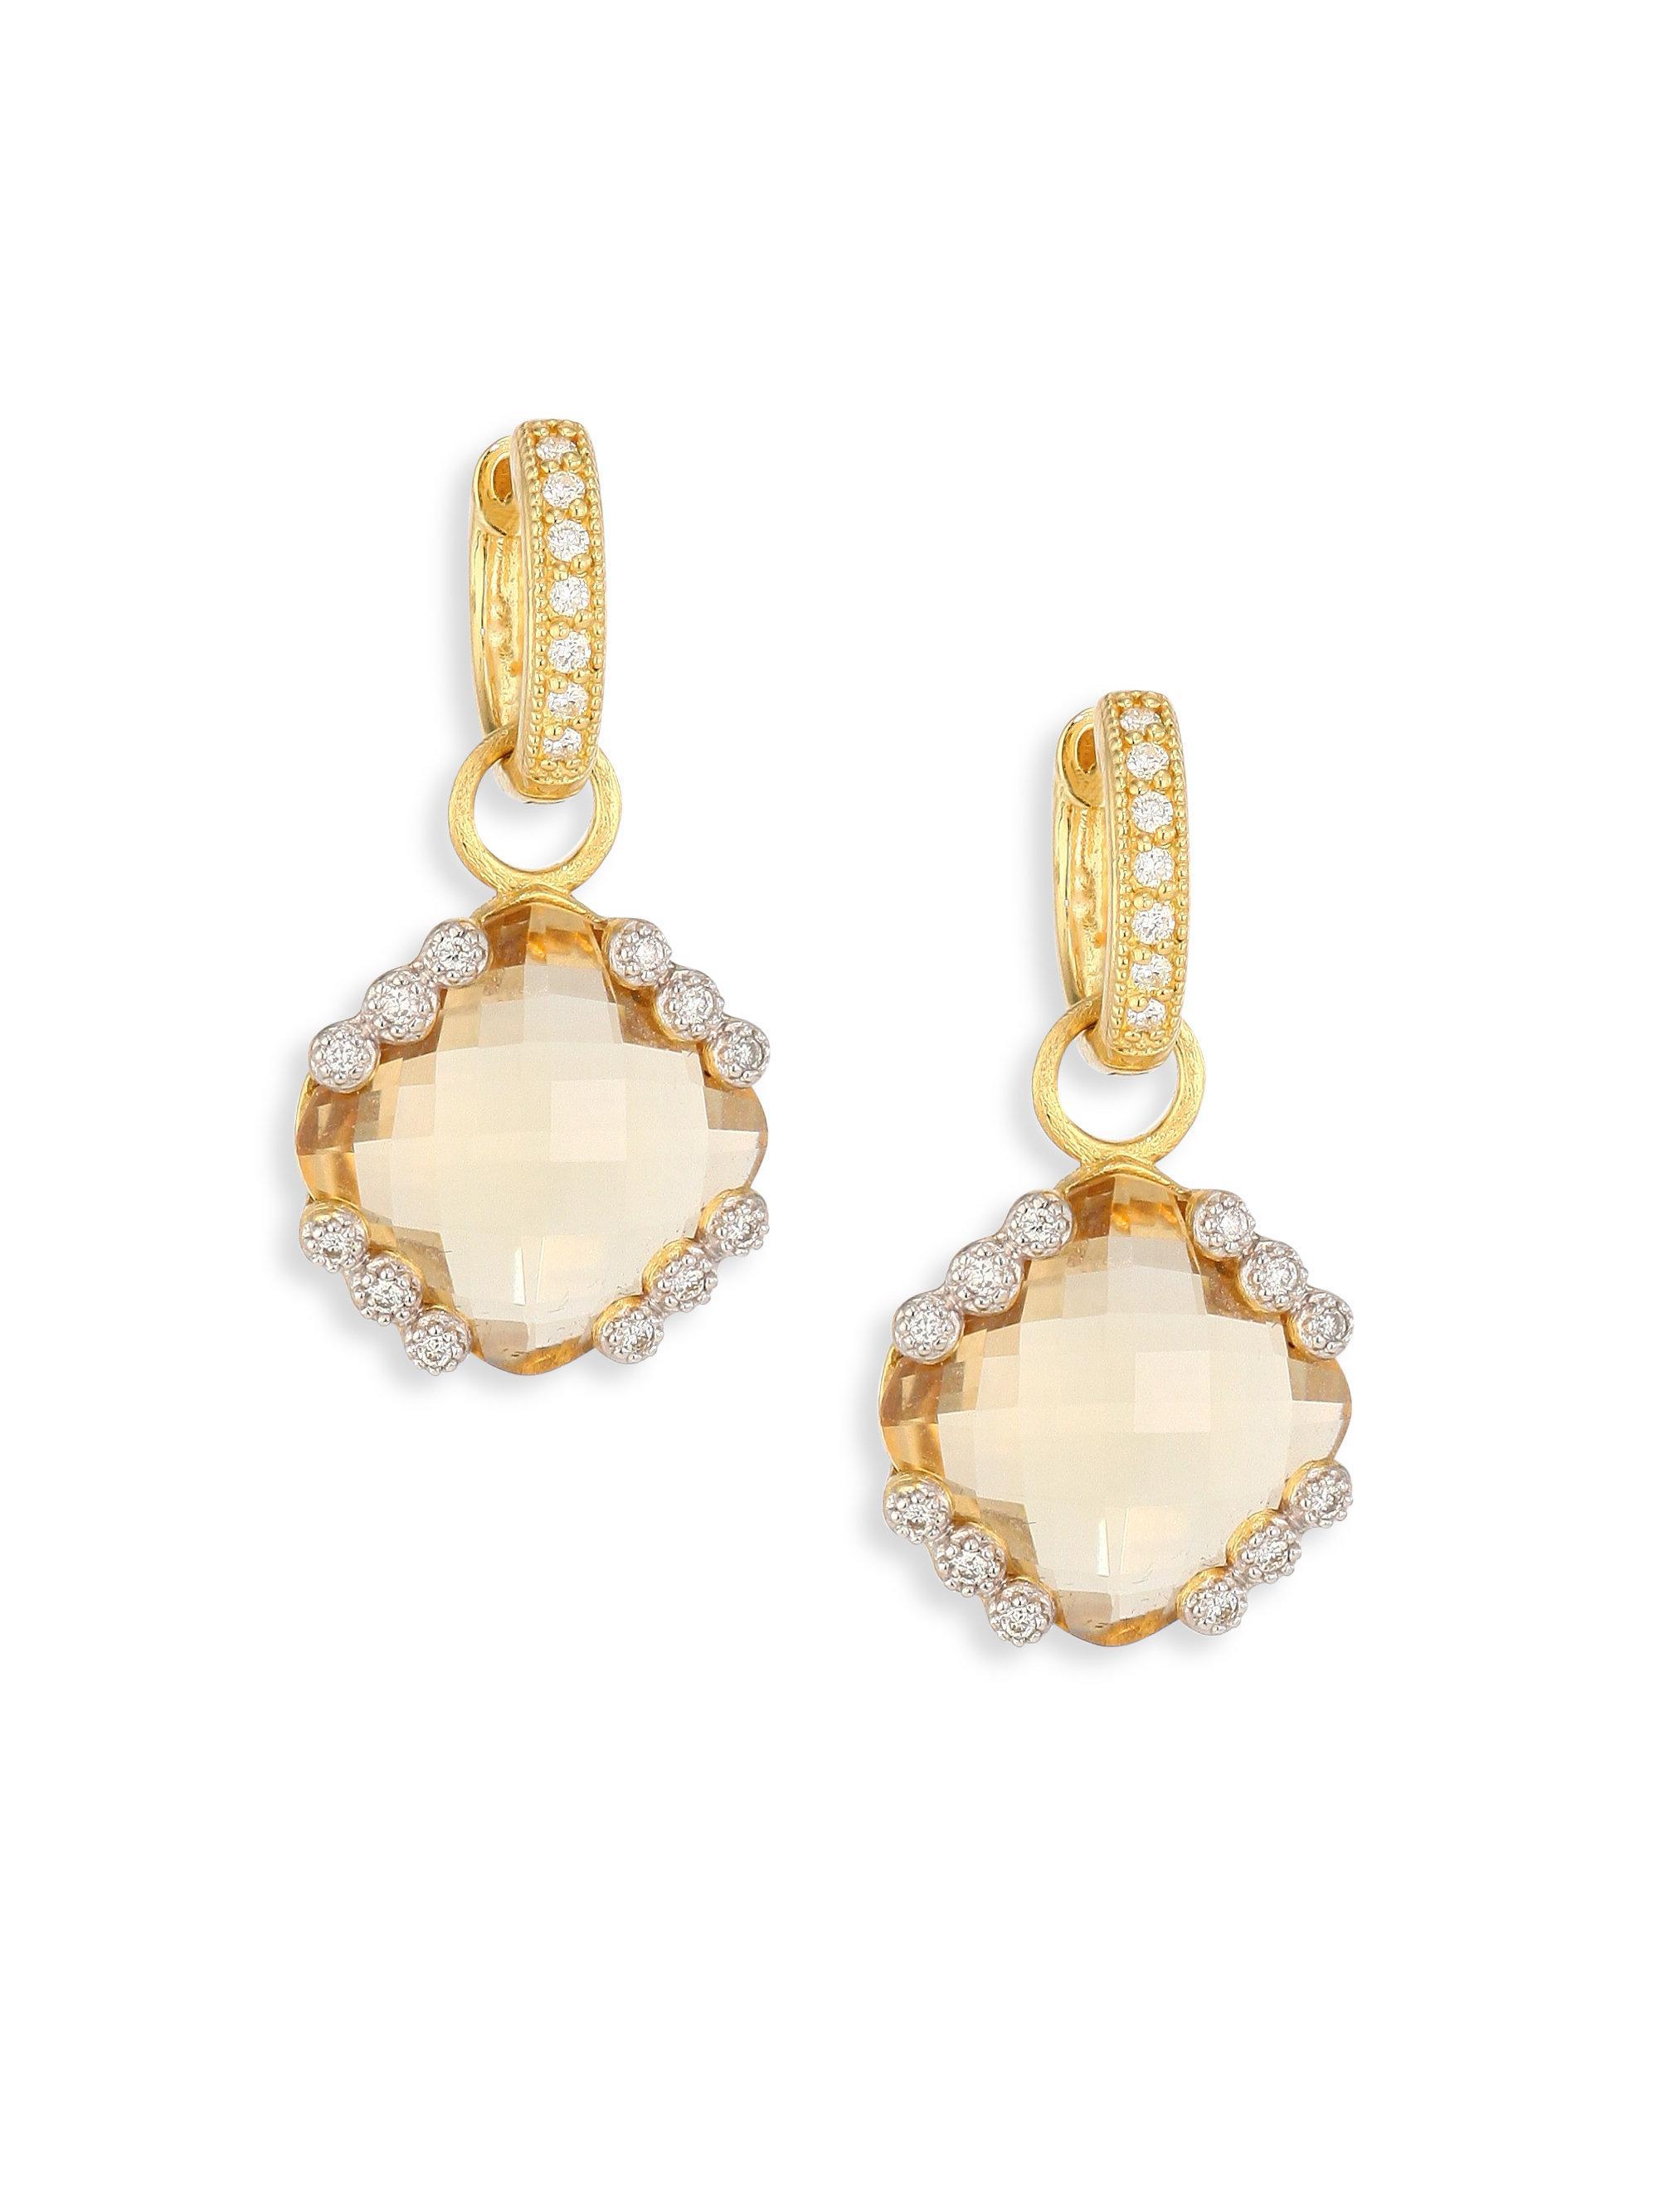 Jude Frances Provence Pearl Drop Earrings in 18K Rose Gold z8WeZOt